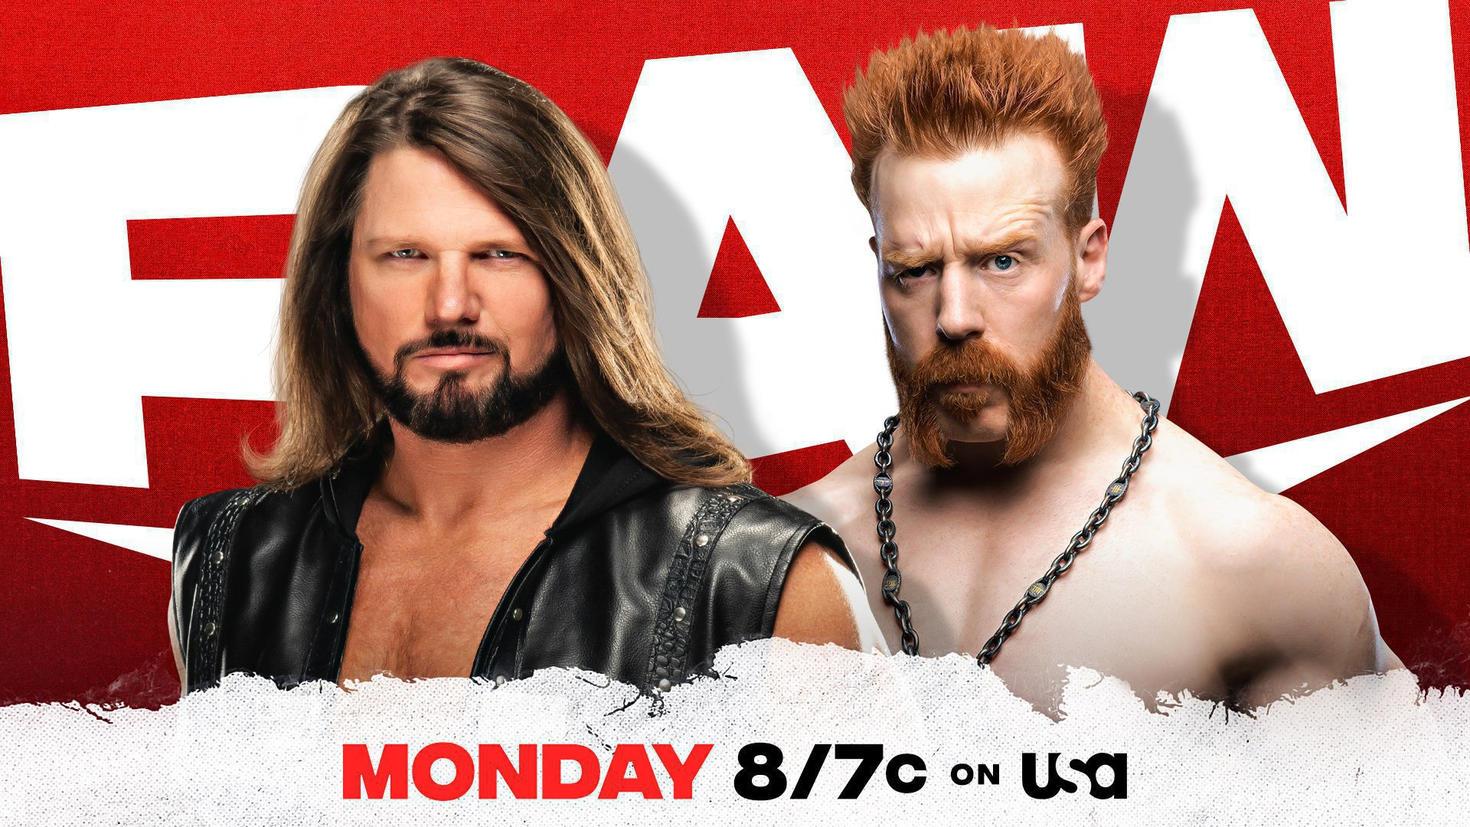 WWE Raw Preview (14/12/20): AJ Styles-Sheamus; Lana-Nia Jax, TLC Go-Home Episode 107